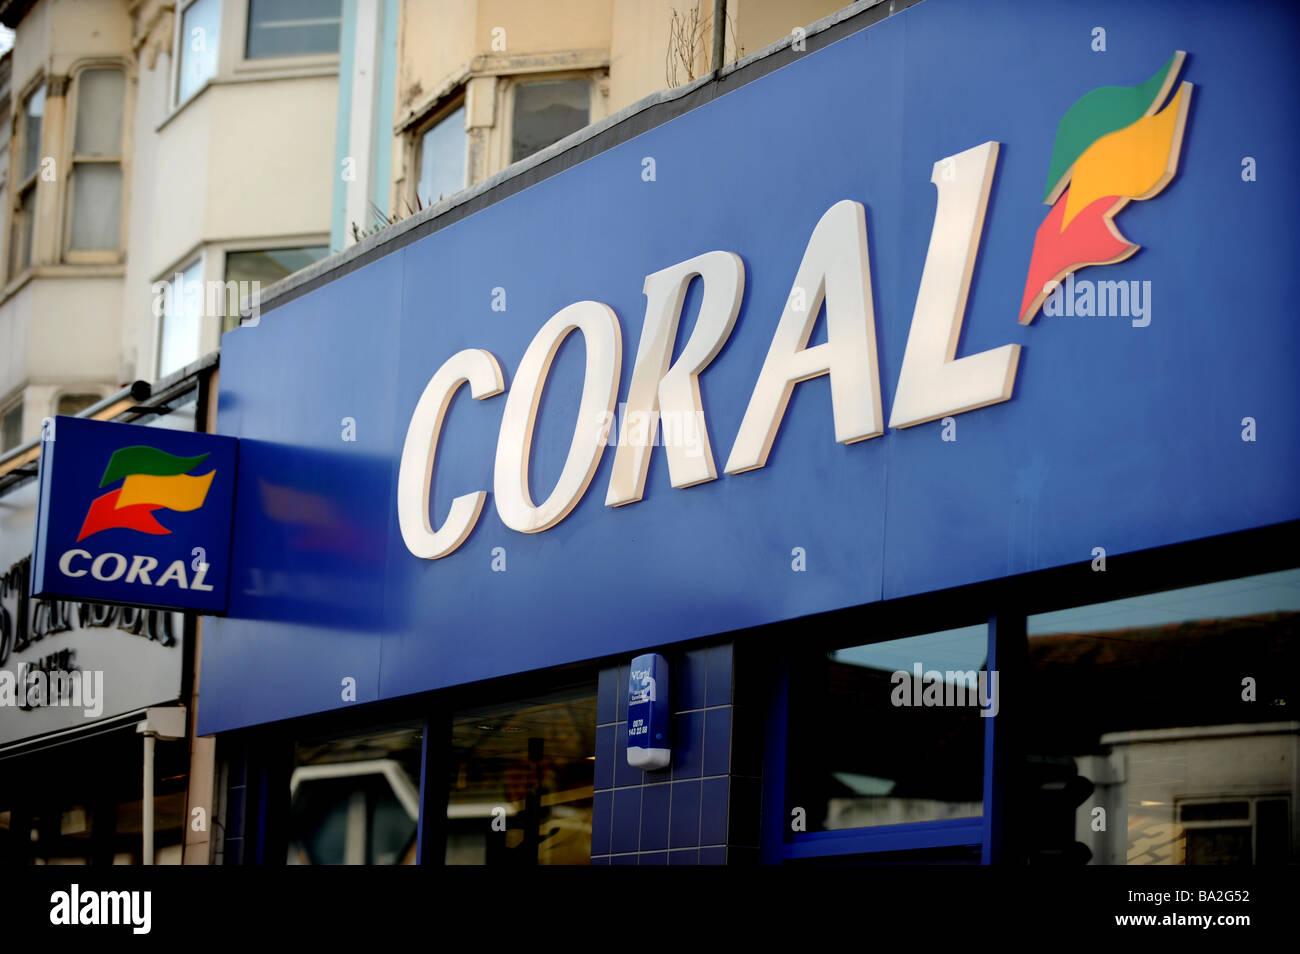 coral betting shop brighton